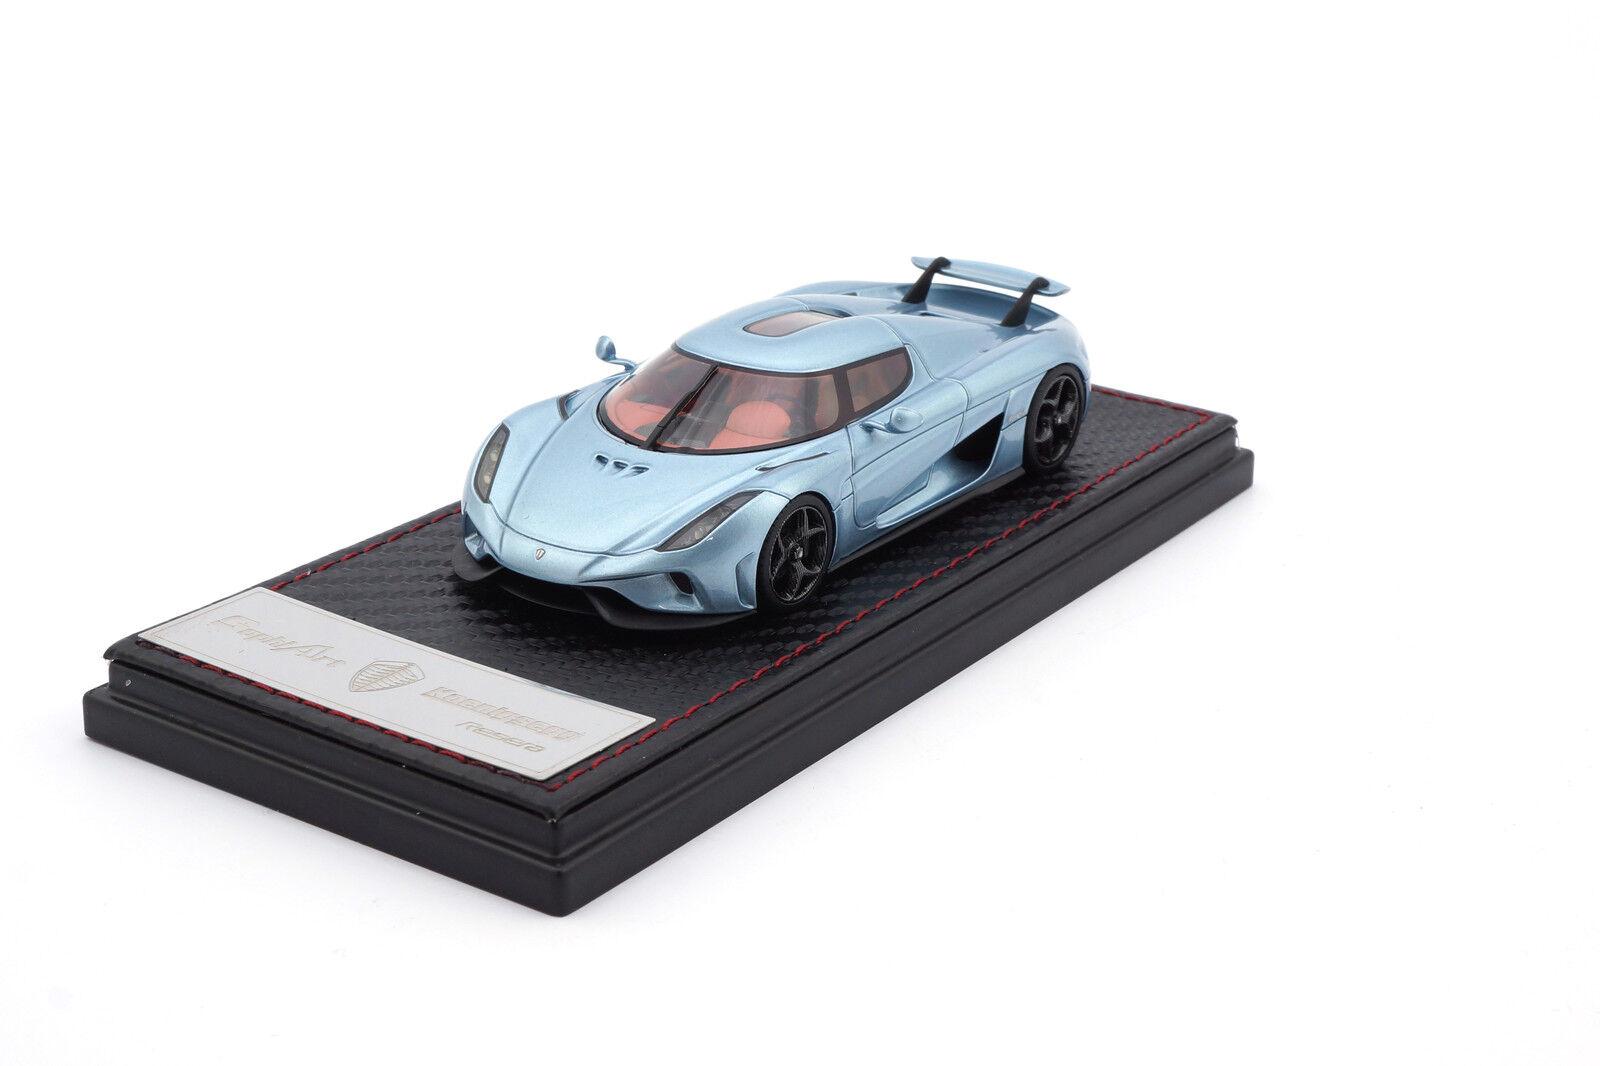 sa001-76 - FRONTIART/sophiart Koenigsegg regera-Horizon blu blu blu - 1:43 634275